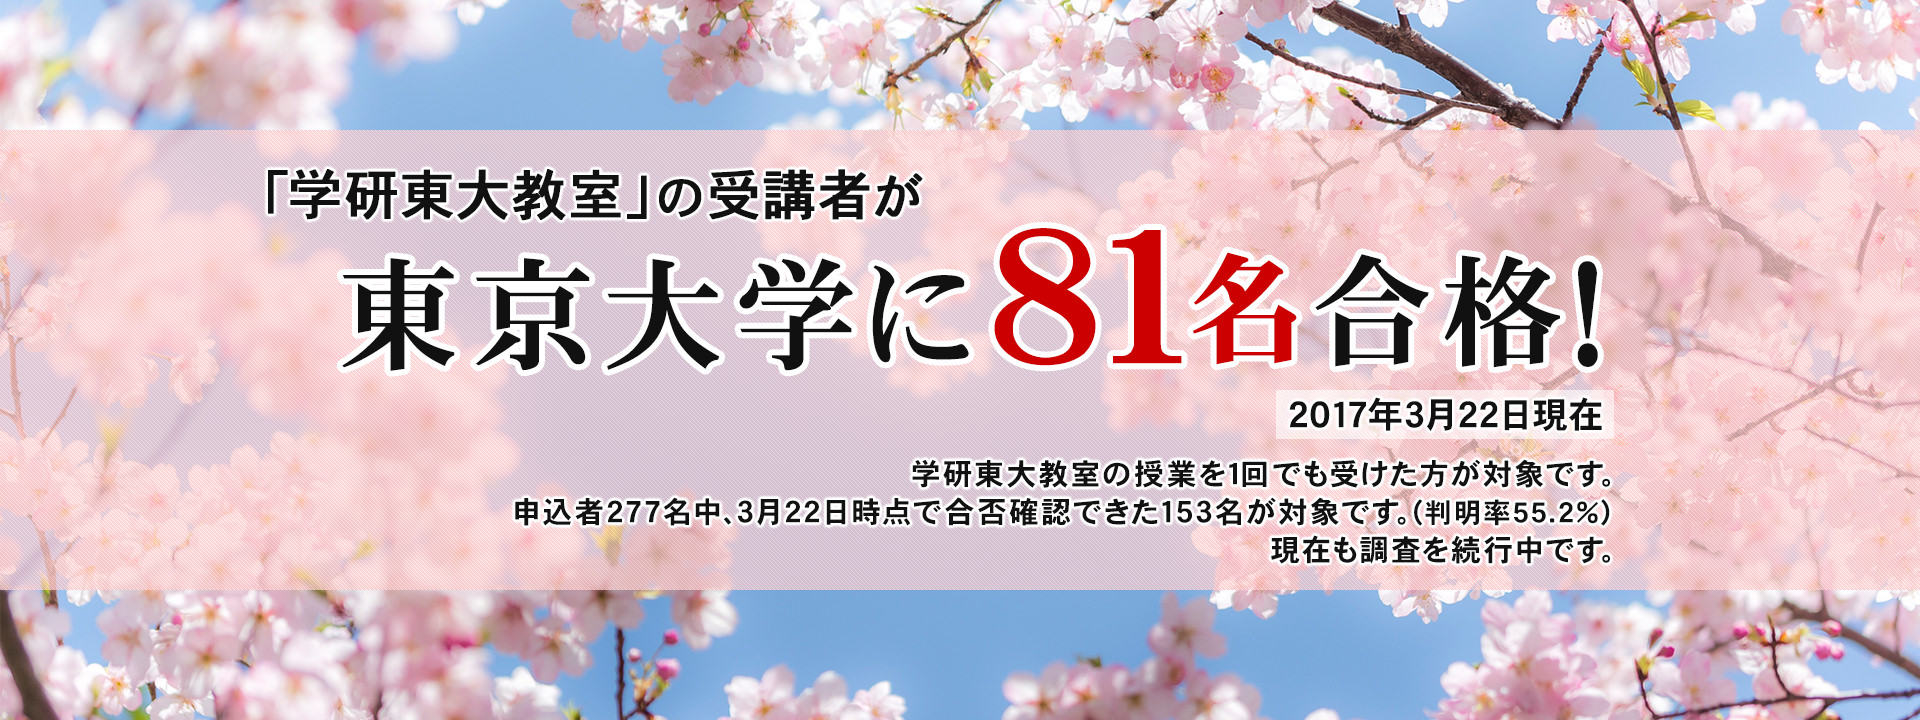 「学研東大教室」の受講者が東京大学に81名合格!